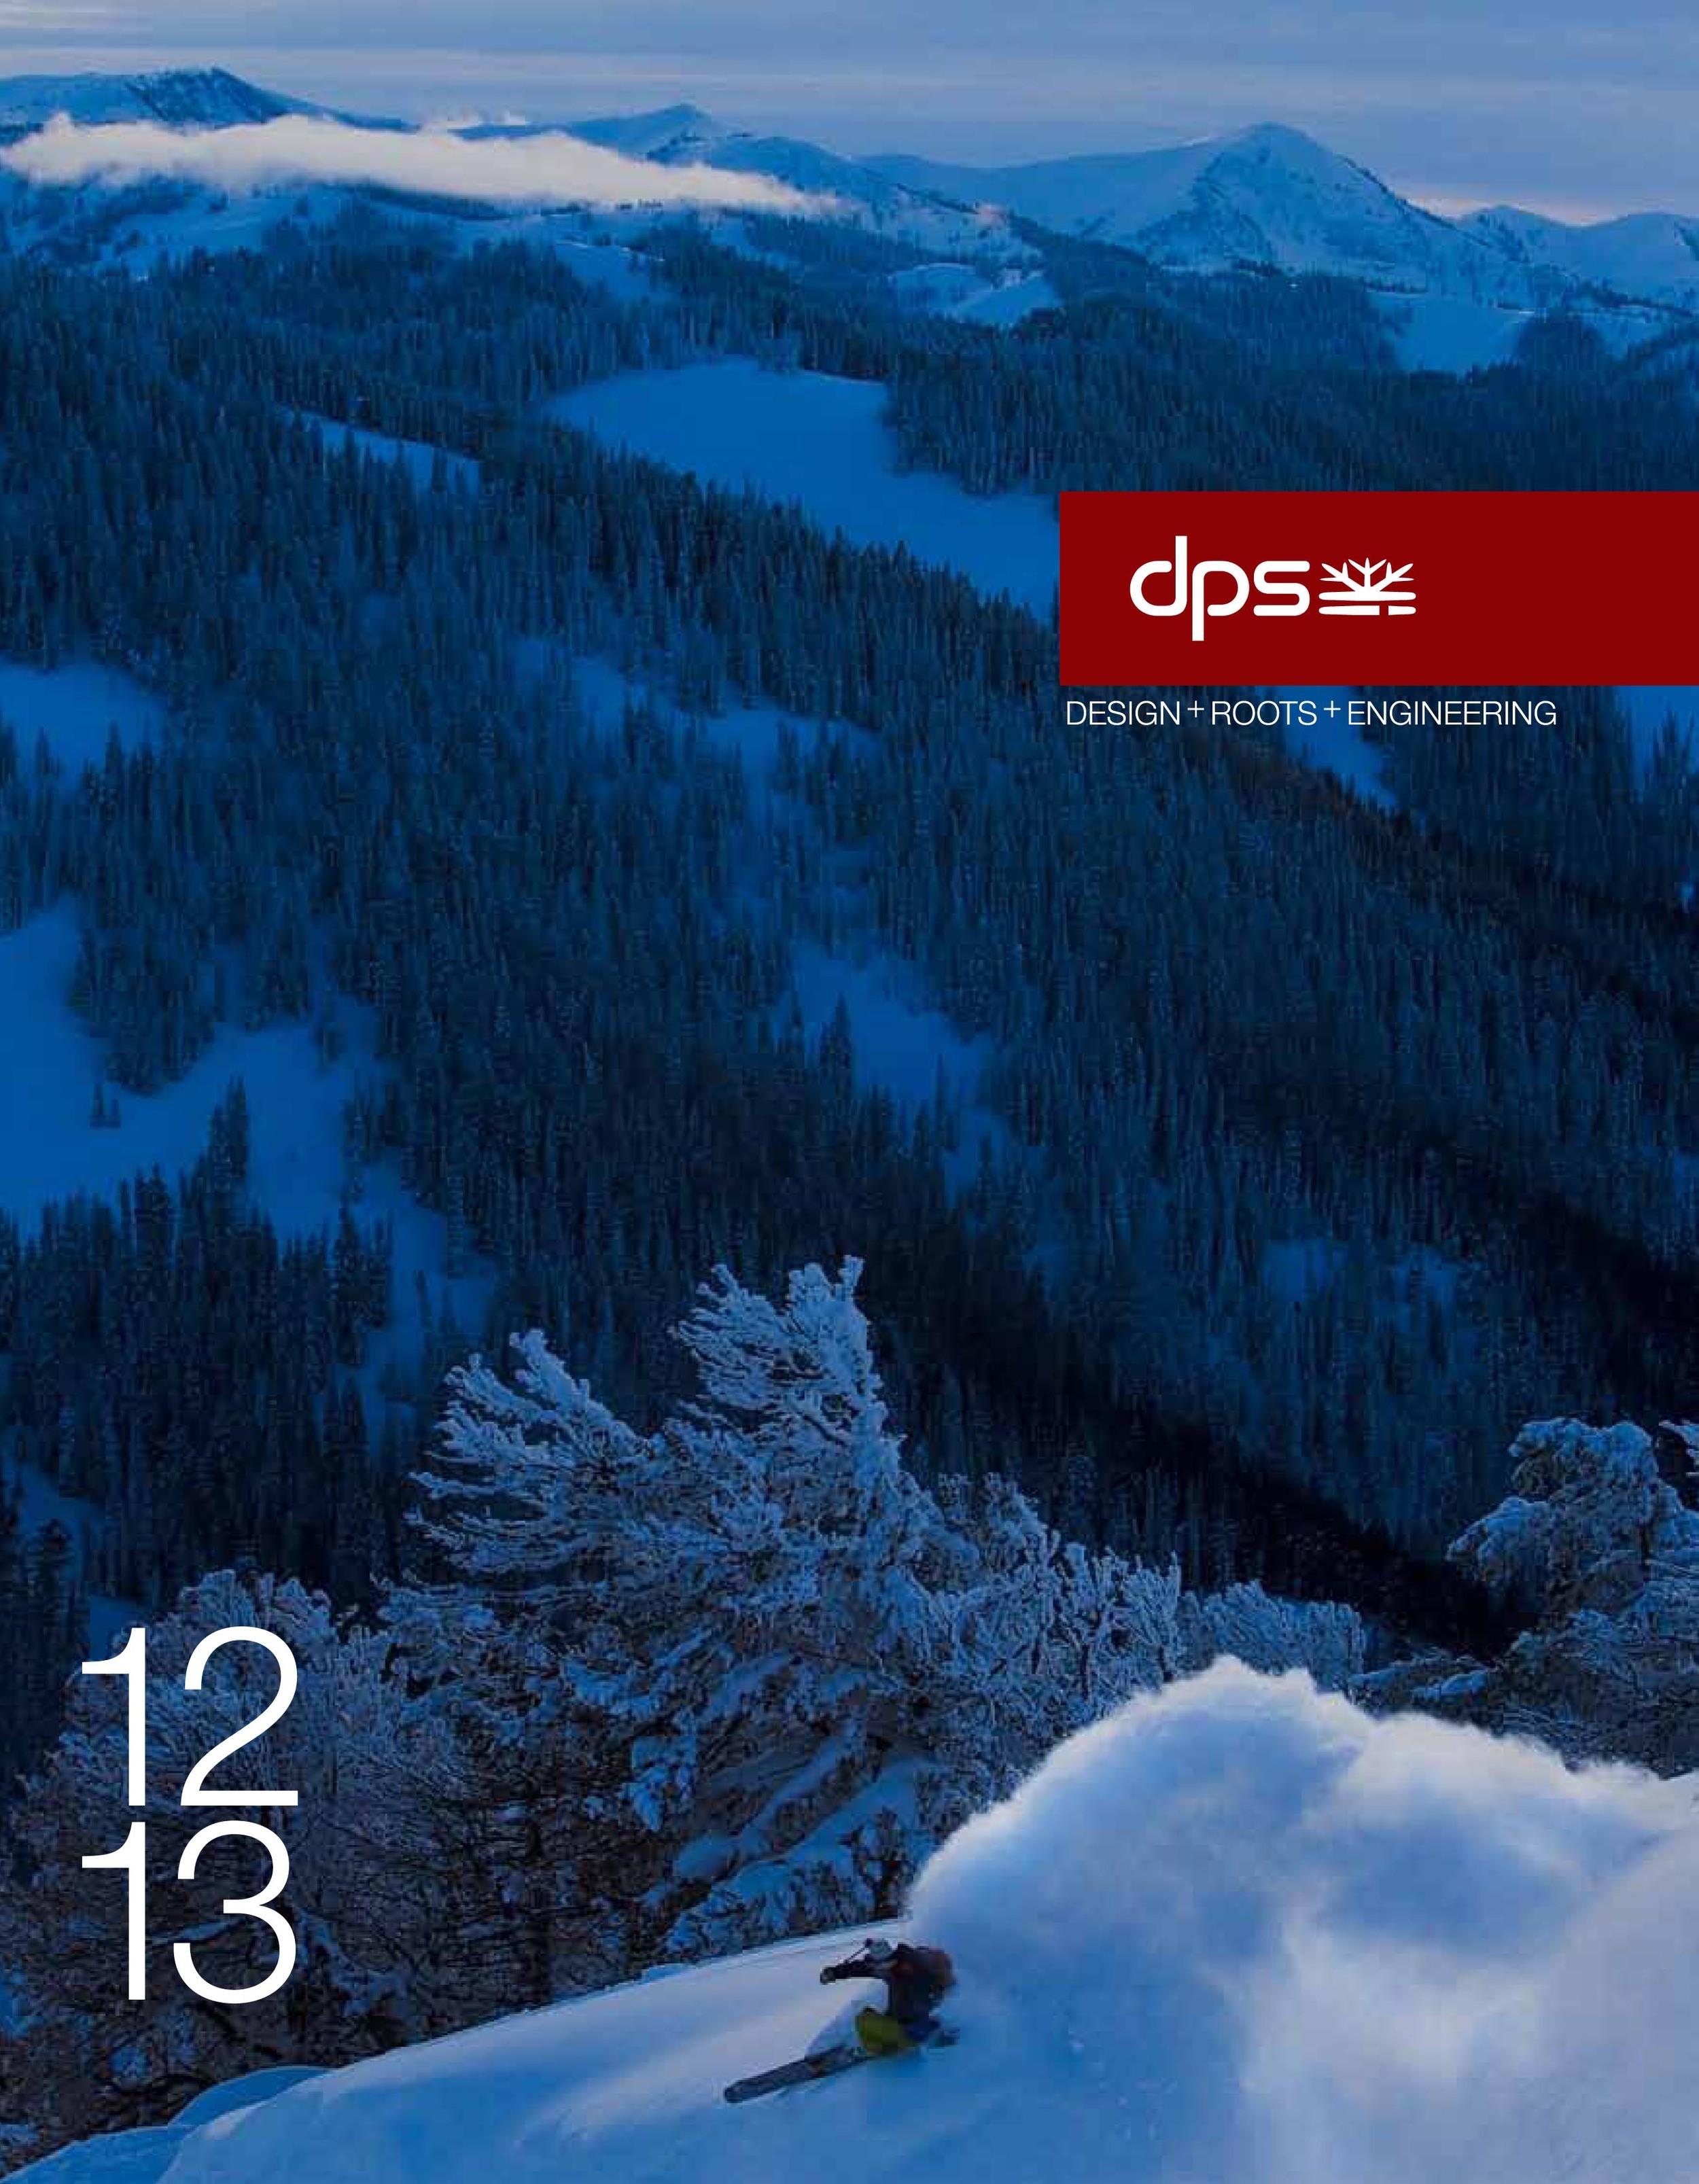 DPS MAGAZINE